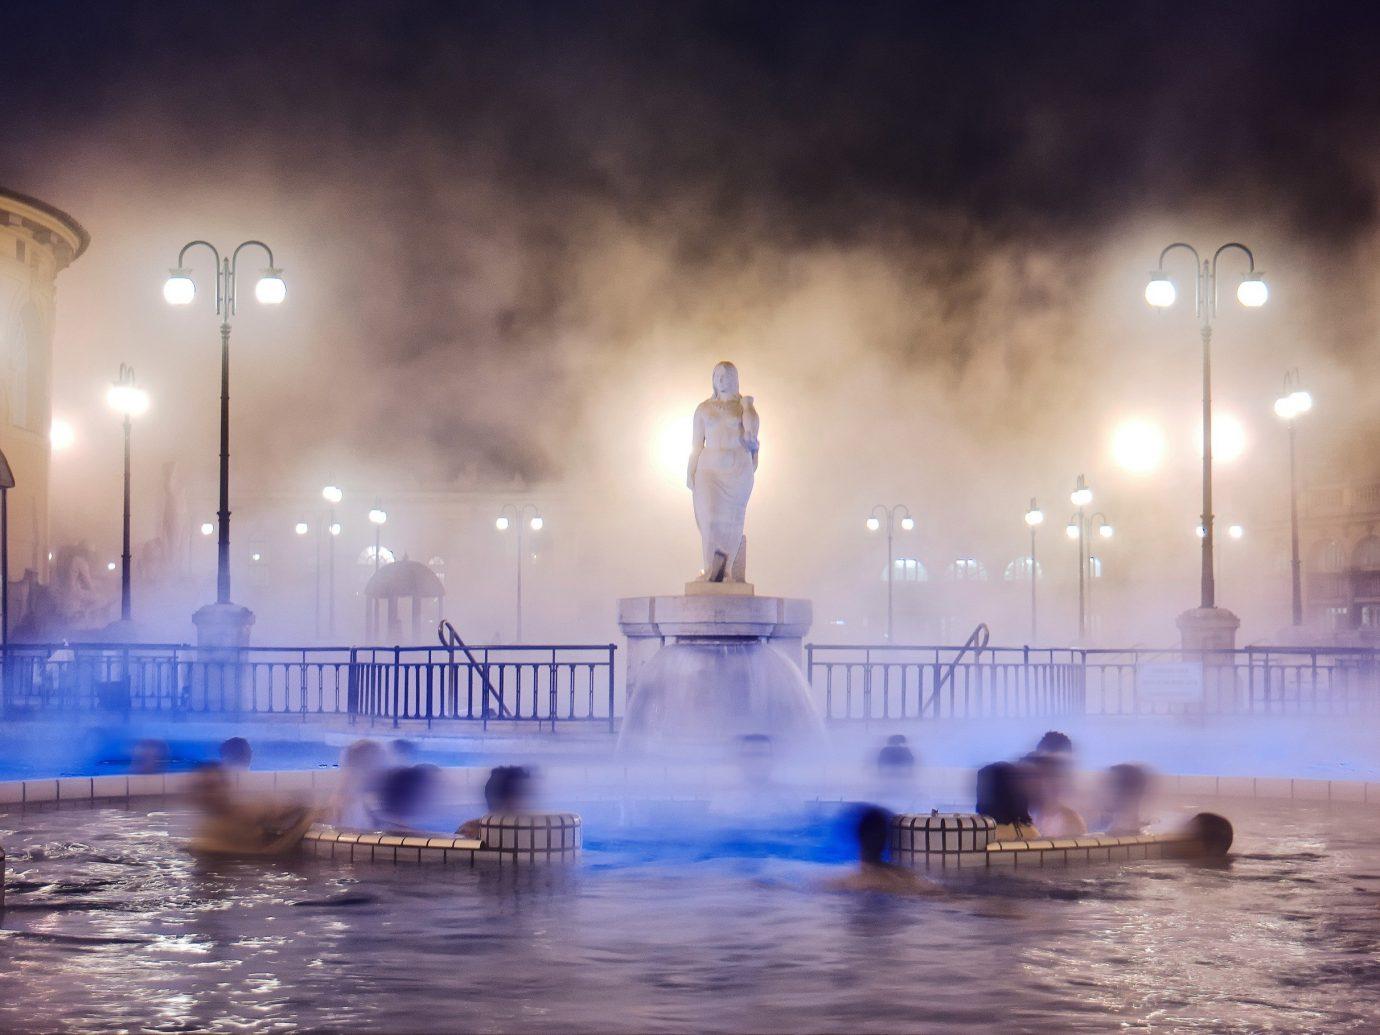 Style + Design fountain atmospheric phenomenon landmark reflection night water feature morning evening cityscape several